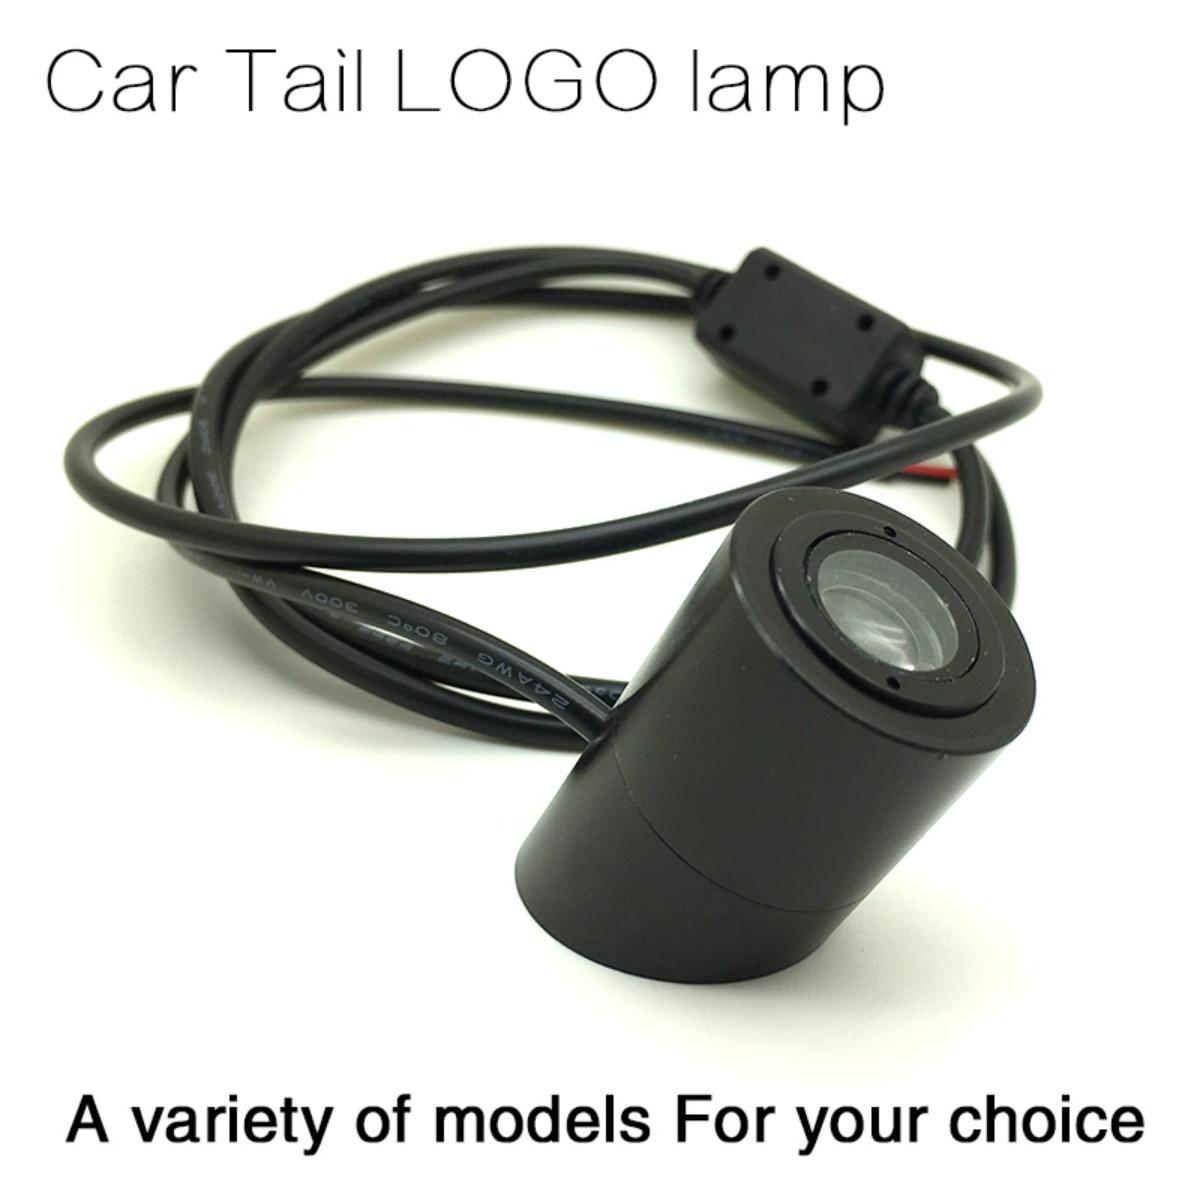 Car Tail Led Light Anti Collision Rear-end Fog Lamp Rearing Warning Honda CRV Accord Civic Odyssey Element Pilot Jazz City - AutoShineSun Store store